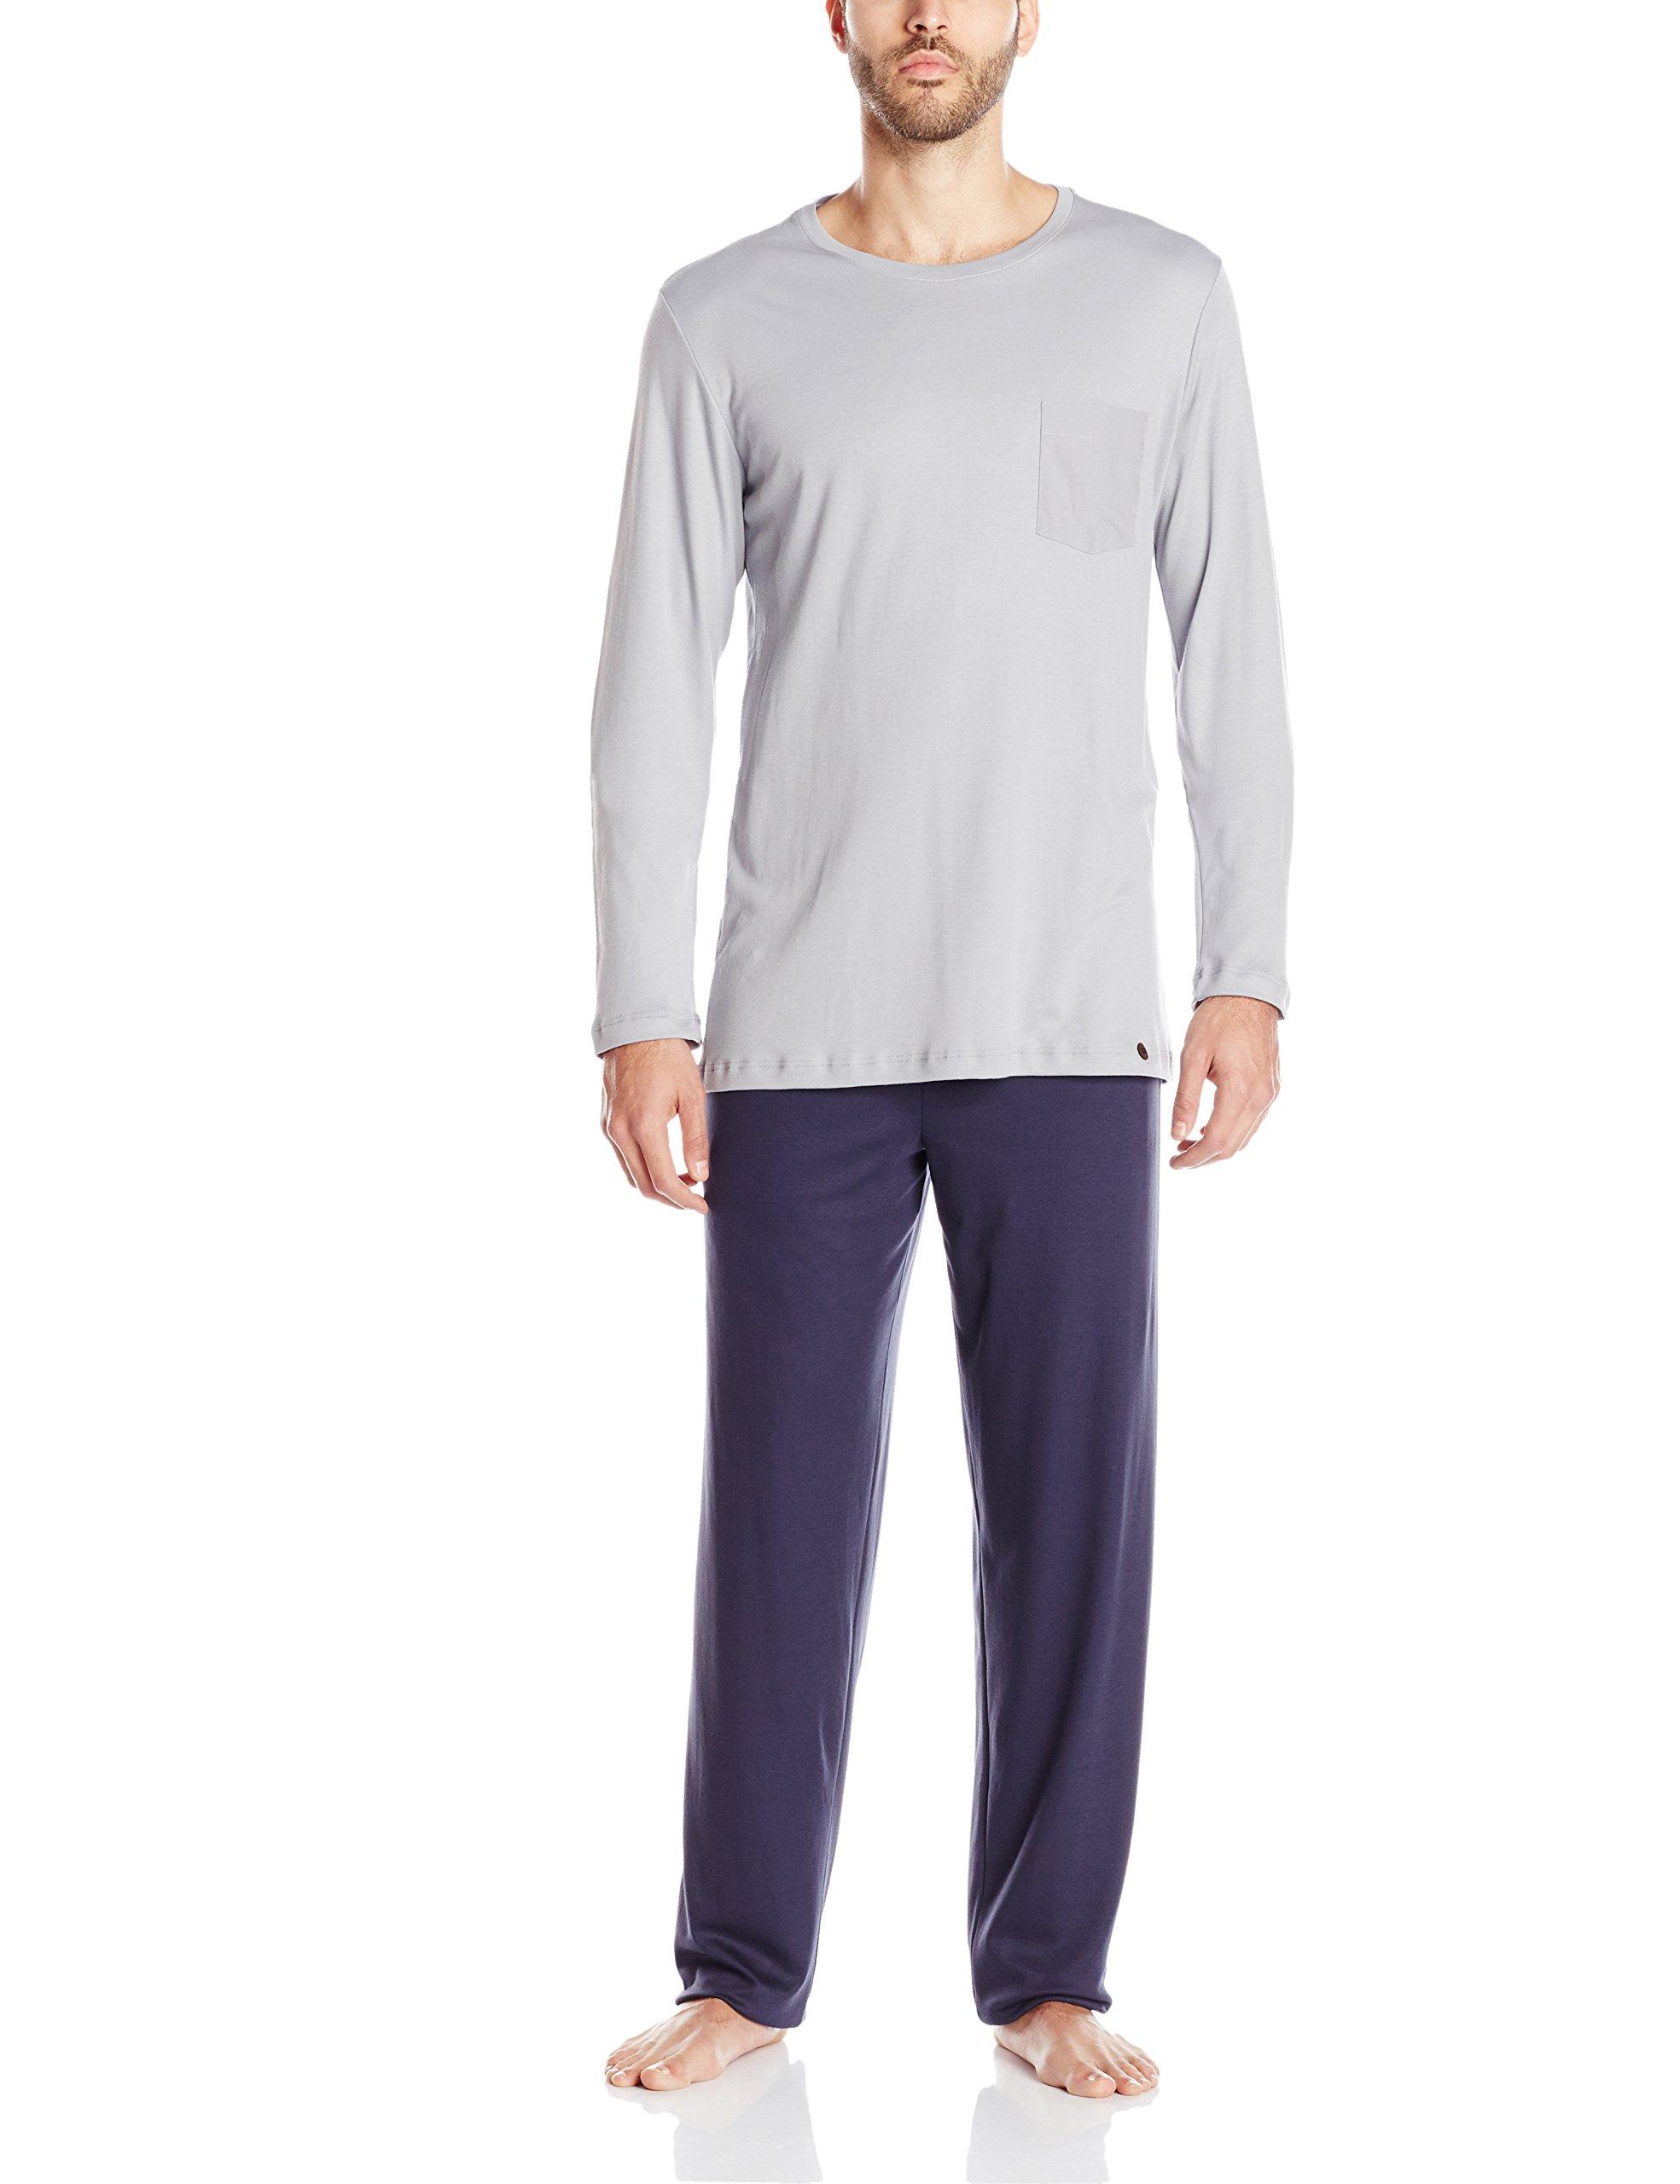 pyjama EnsembleBleu 1162Ltaille FabricantLHomme 1 Hanro Day Nightamp; blaumineral Arm 1 lFK13TcJ